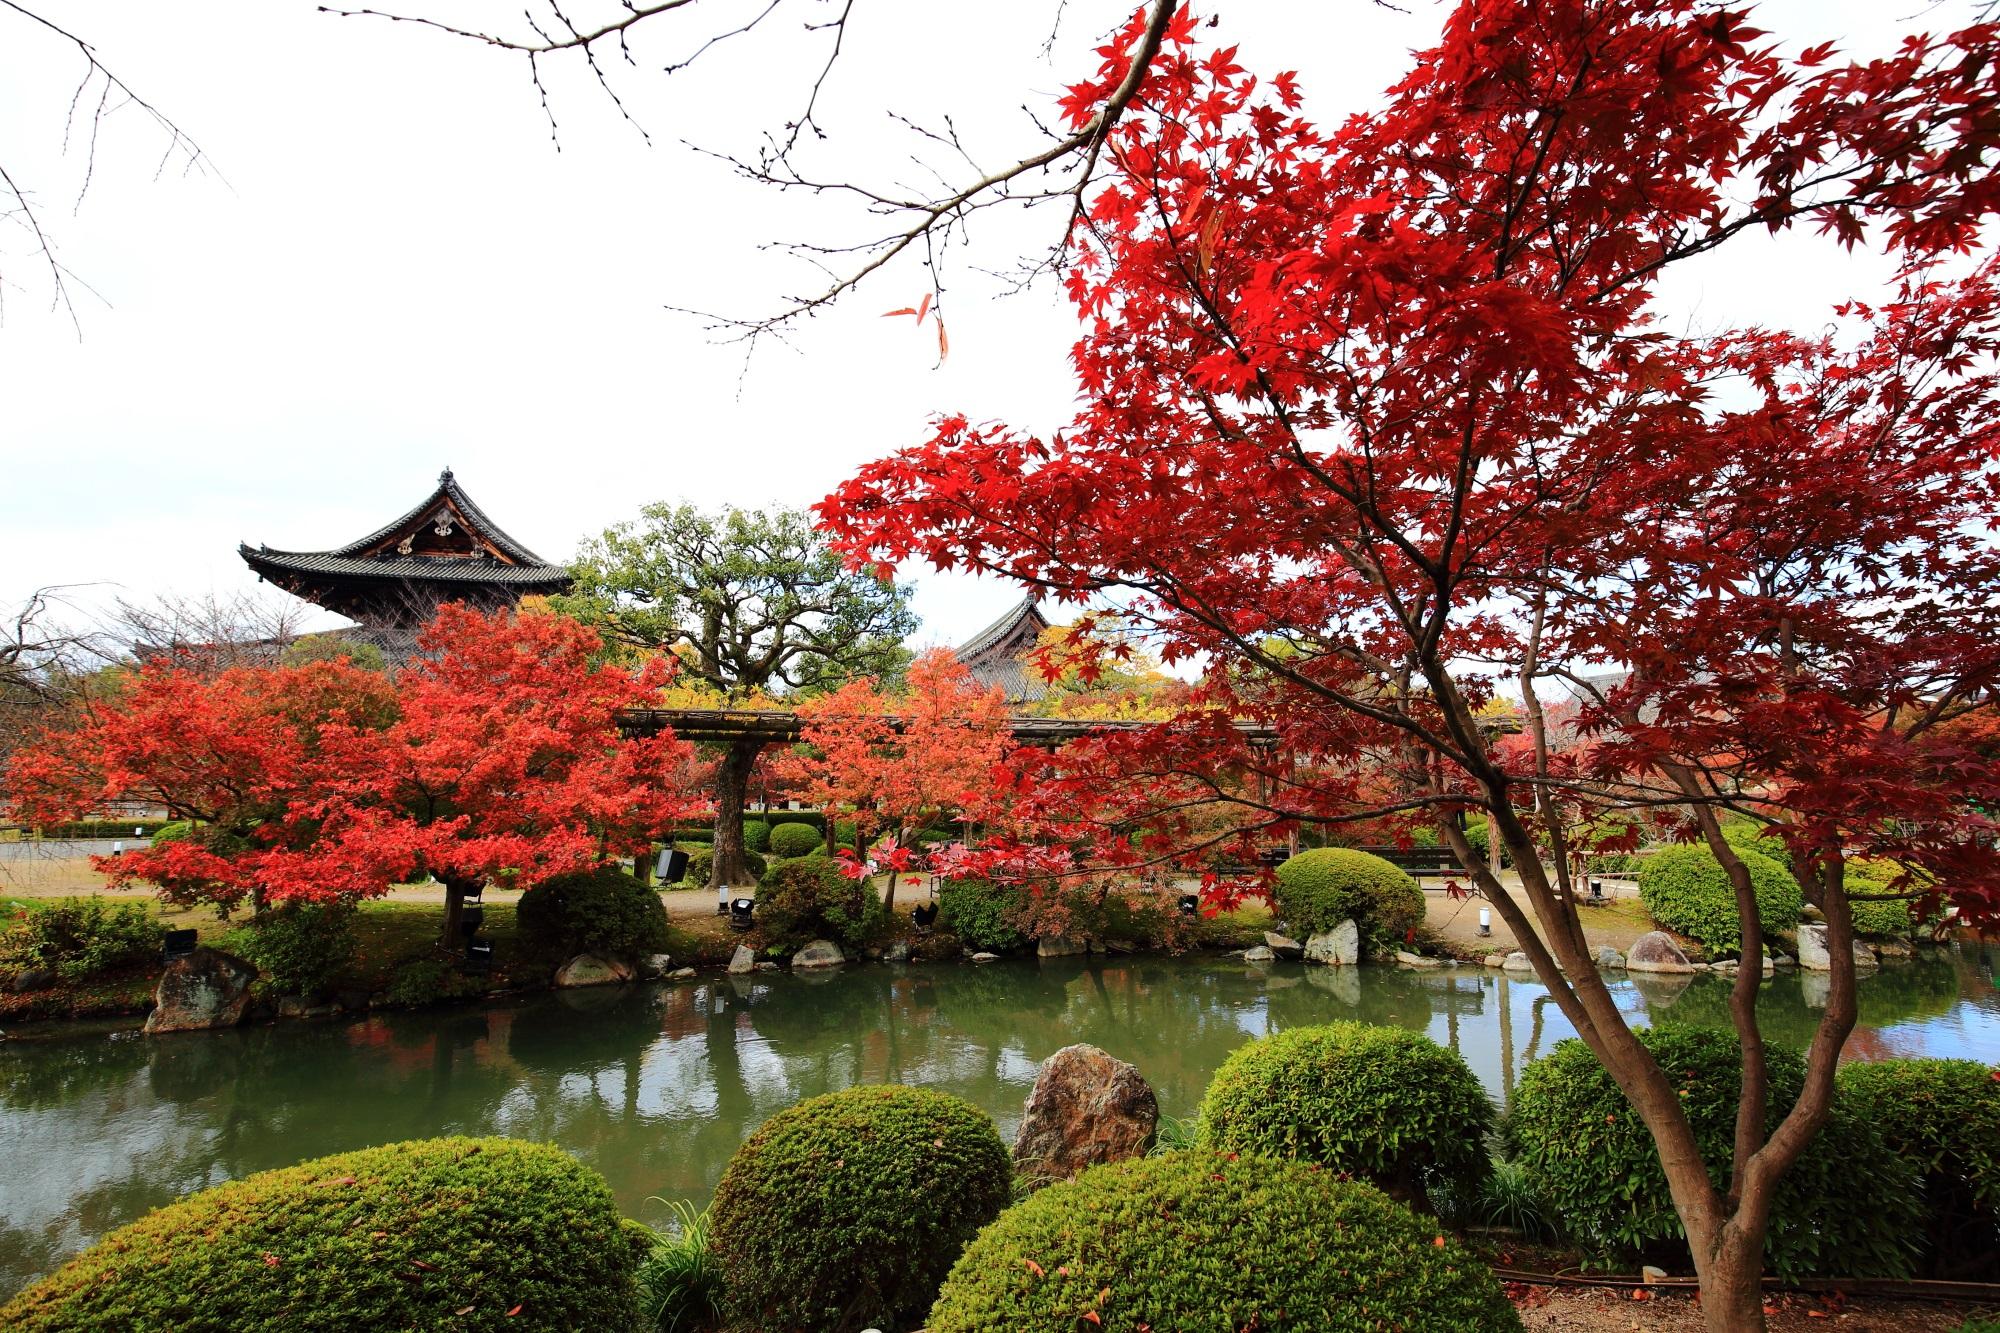 To-ji Temple Kyoto 紅葉 見ごろ 秋 金堂 講堂 瓢箪池